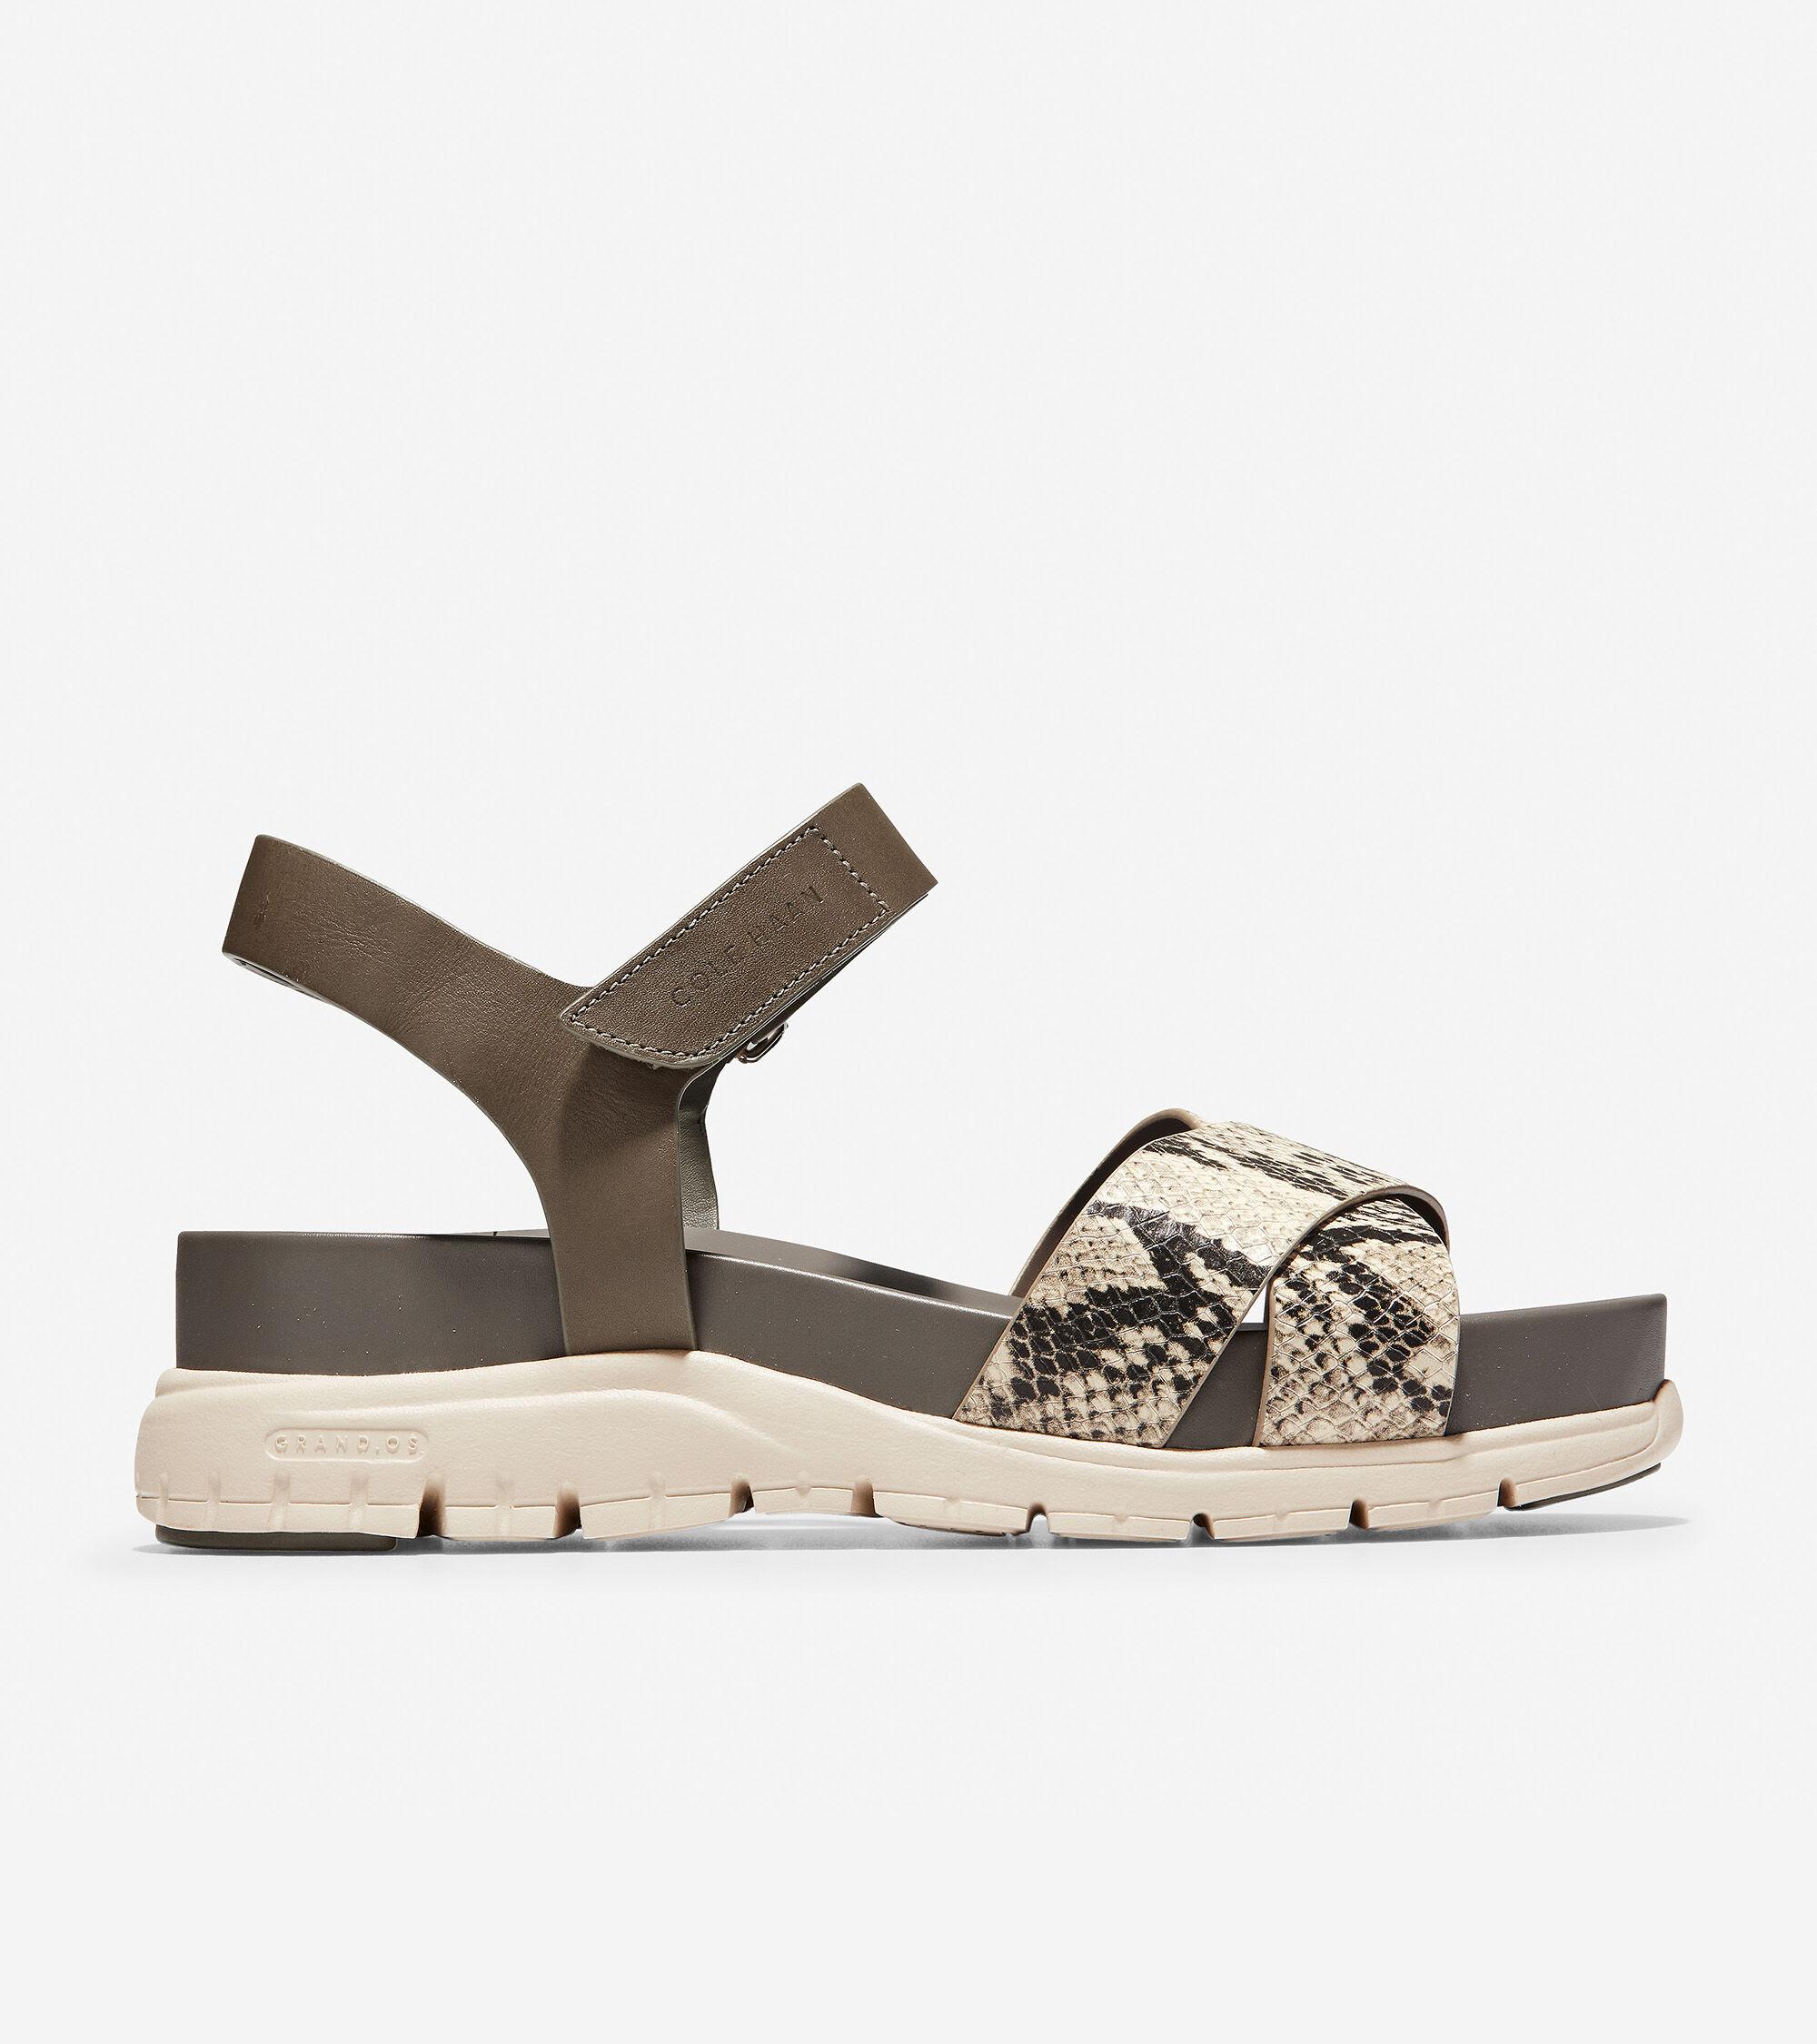 cb3b2beda Women s ZEROGRAND Crisscross Sandals in Snake Print